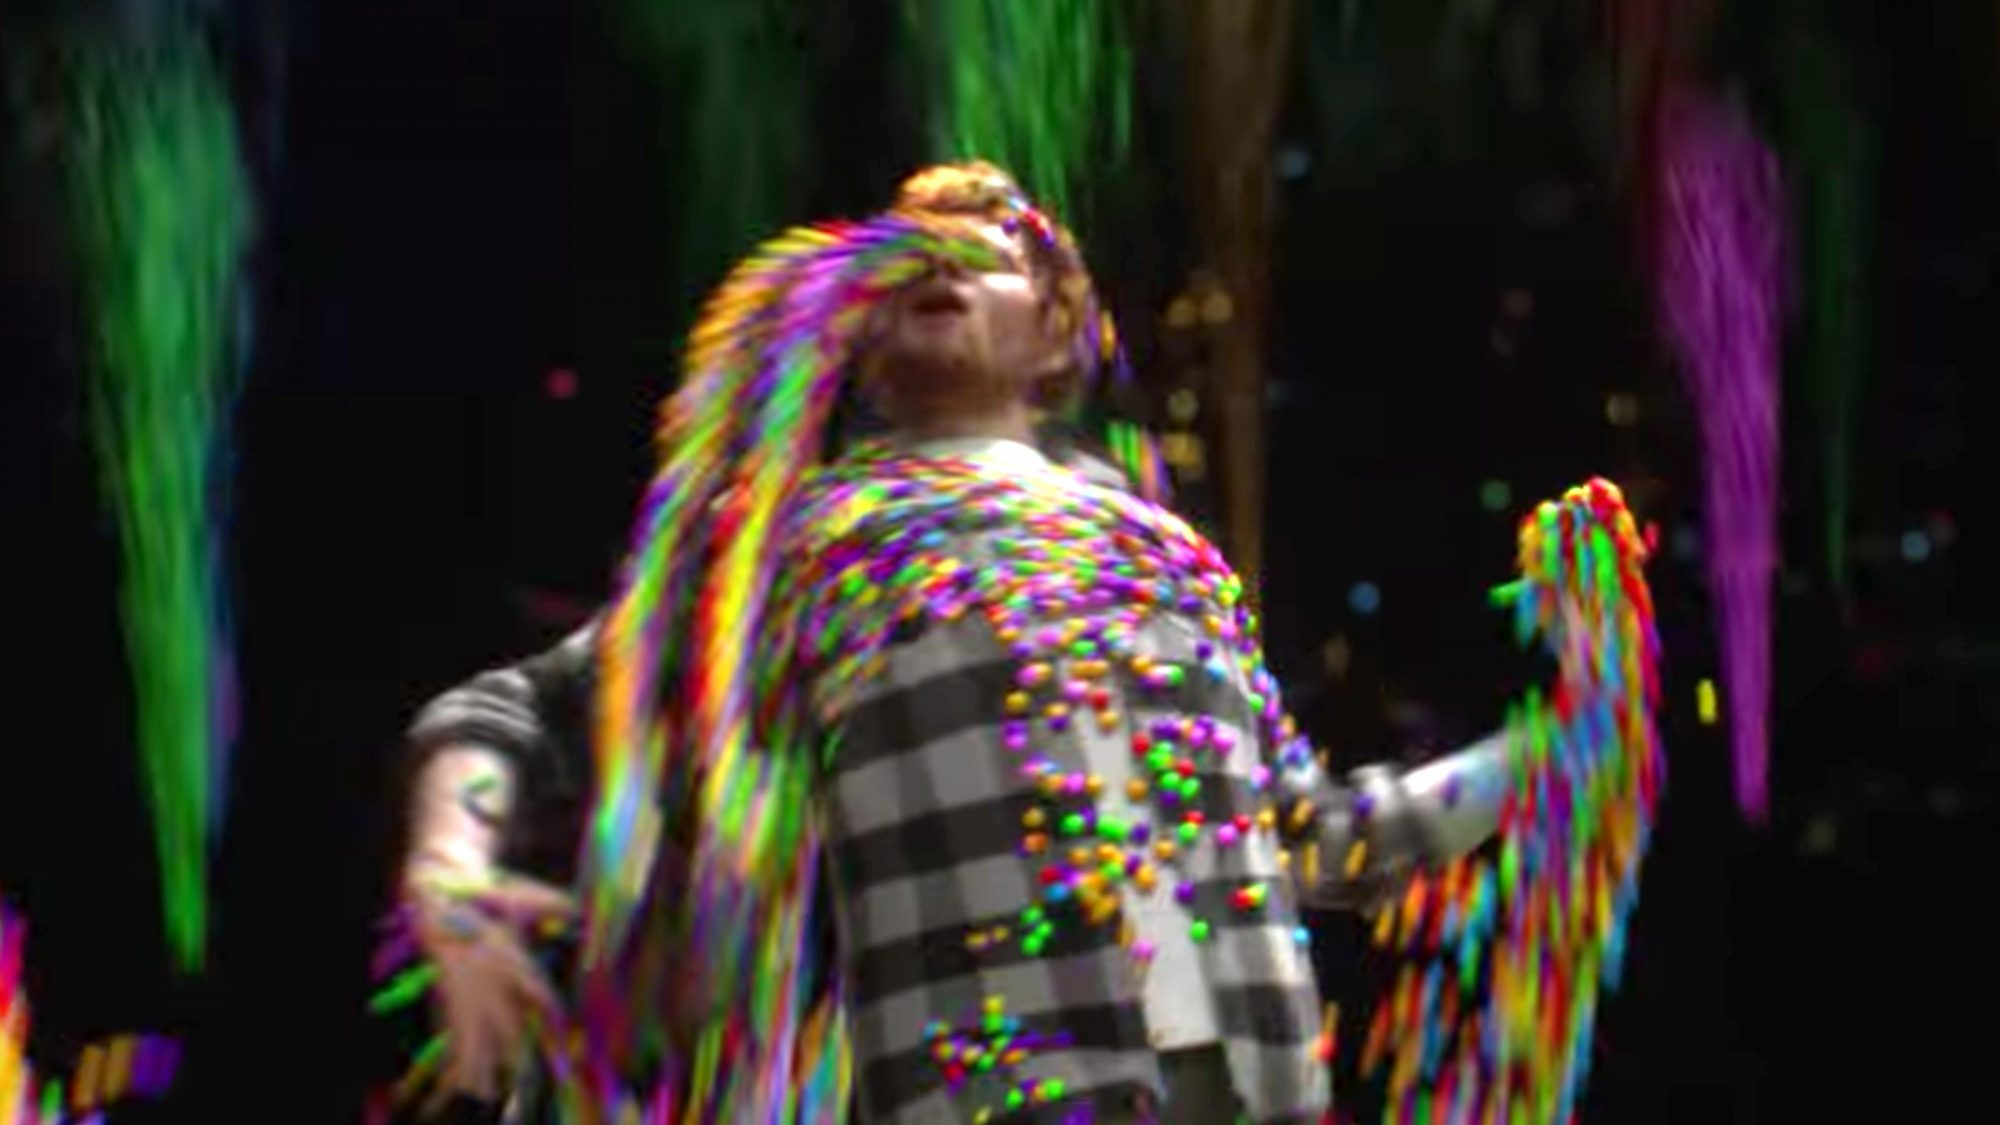 Ed Sheeran - Cross Me (feat. Chance The Rapper & PnB Rock) [Official Video] (screen grab) https://www.youtube.com/watch?v=S5n9emOr7SQ CR: Ed Sheeran/YouTube